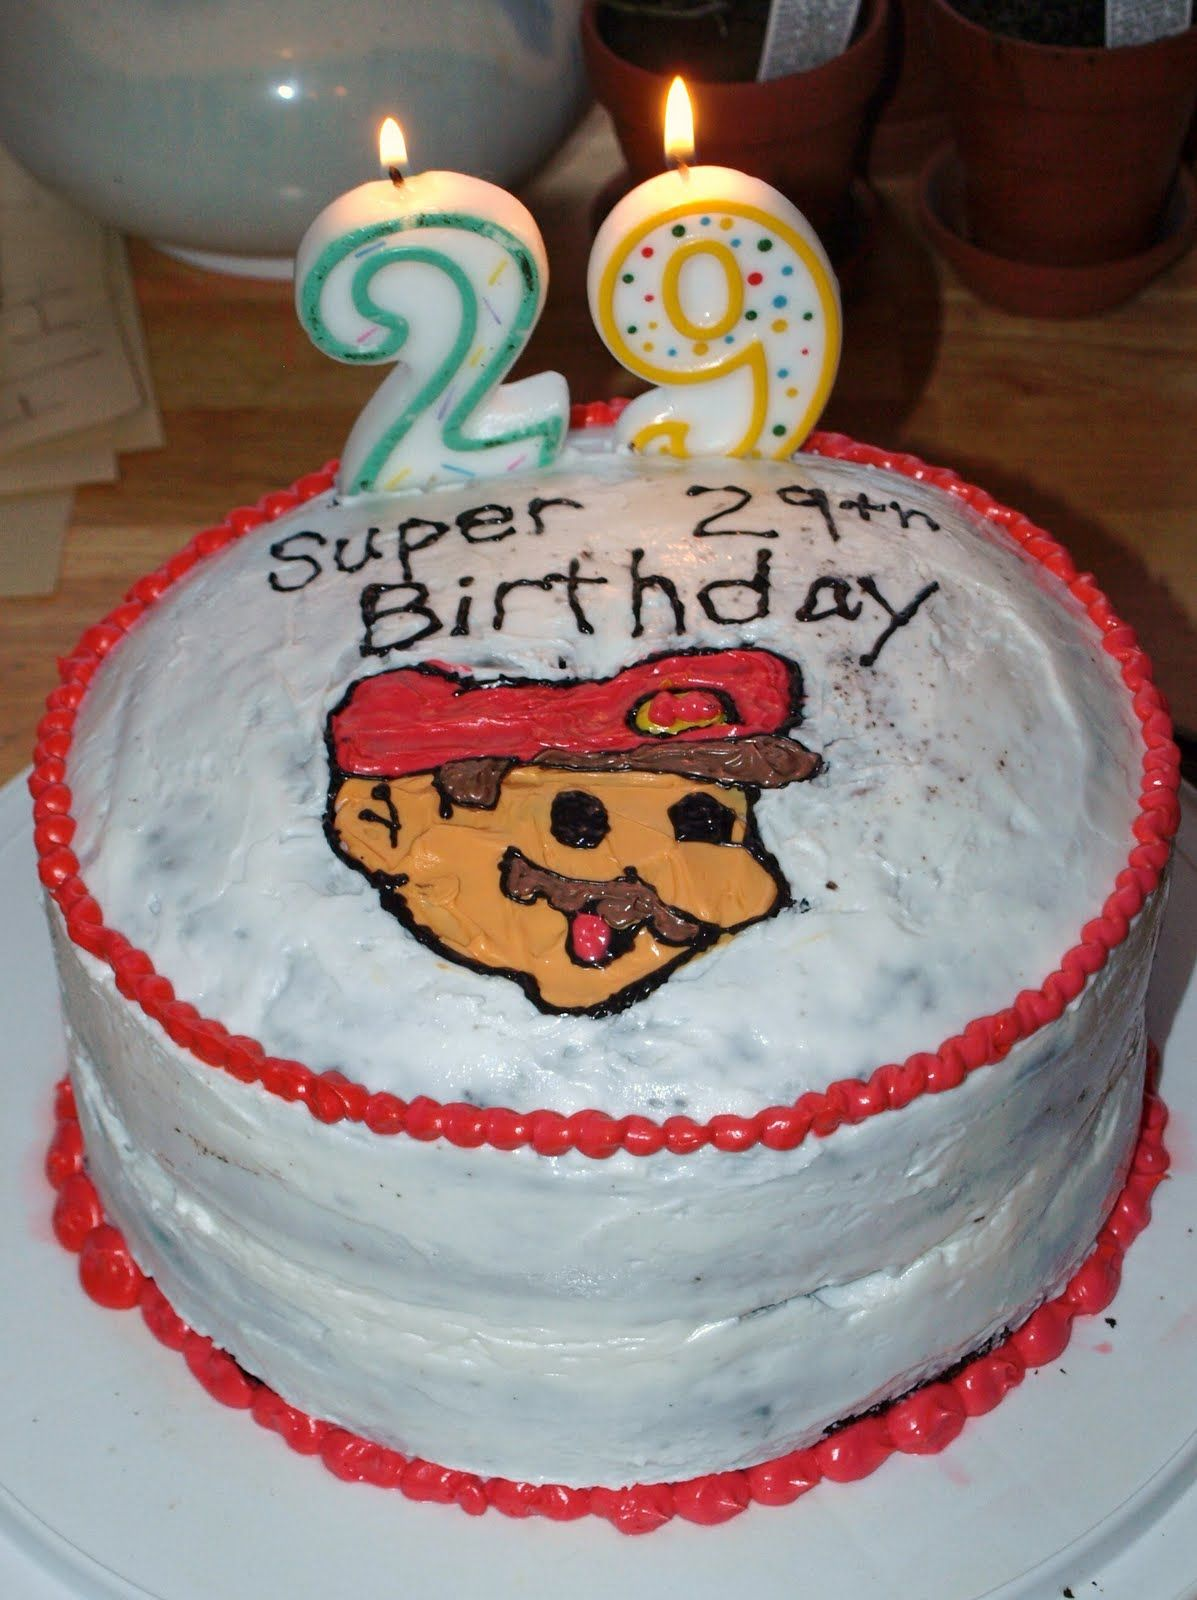 Super Mario Birthday Cake For 29th Birthday Birthday Cake Designs